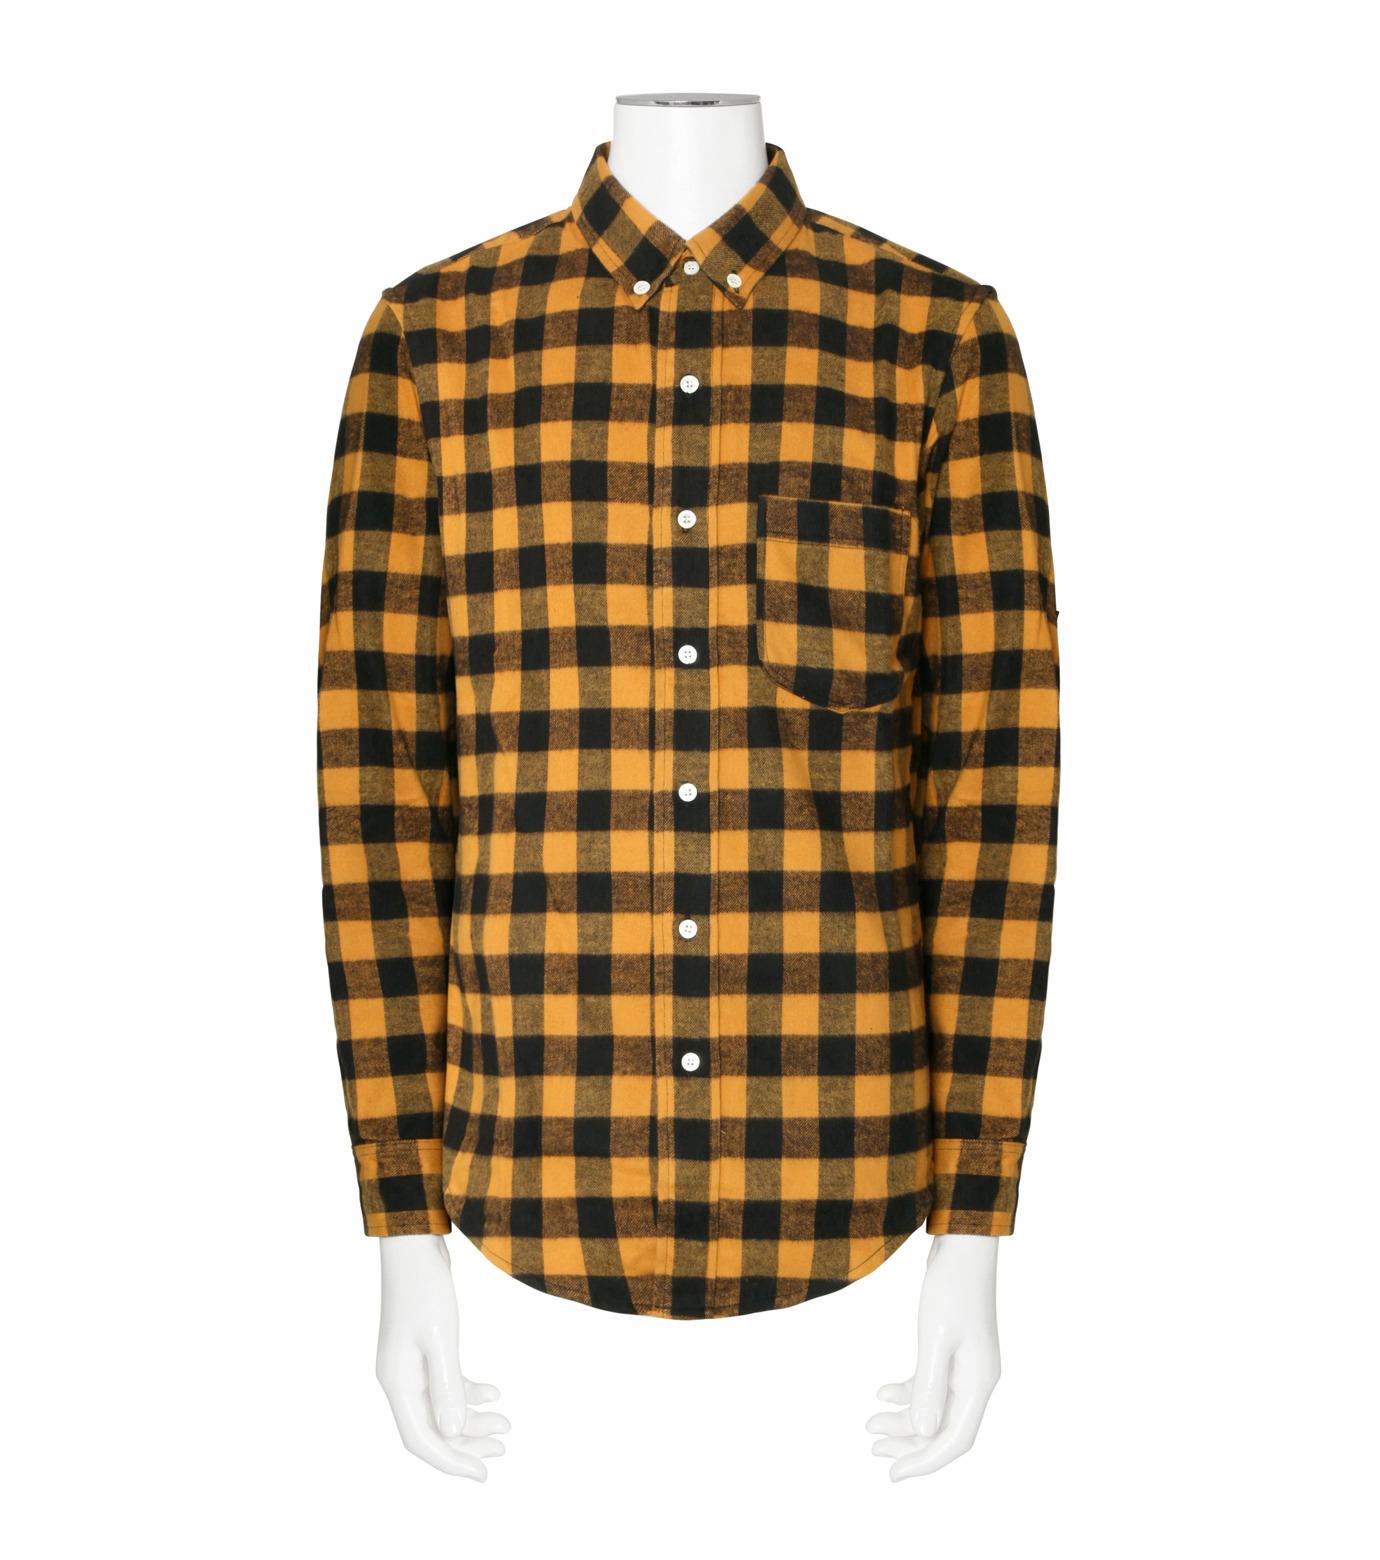 PALM ANGELS(パーム・エンジェルス)のBUFFALO CHECK SHIRT-GREEN(シャツ/shirt)-6092055-22 拡大詳細画像1